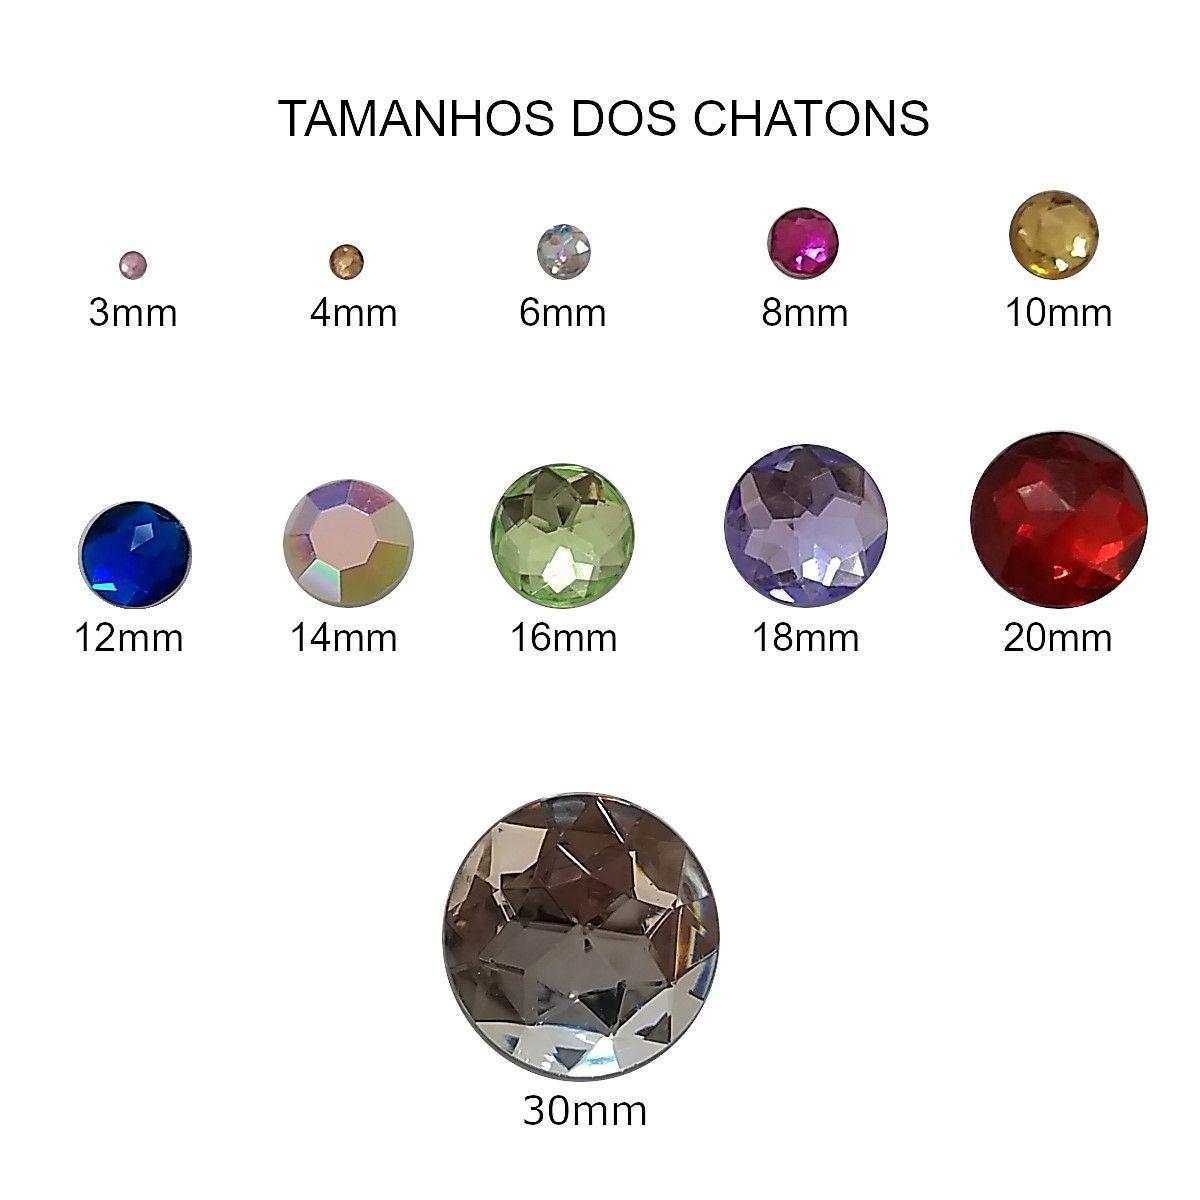 Chaton Costura Redondo Azul Claro 6mm a 16mm  - SanBiju